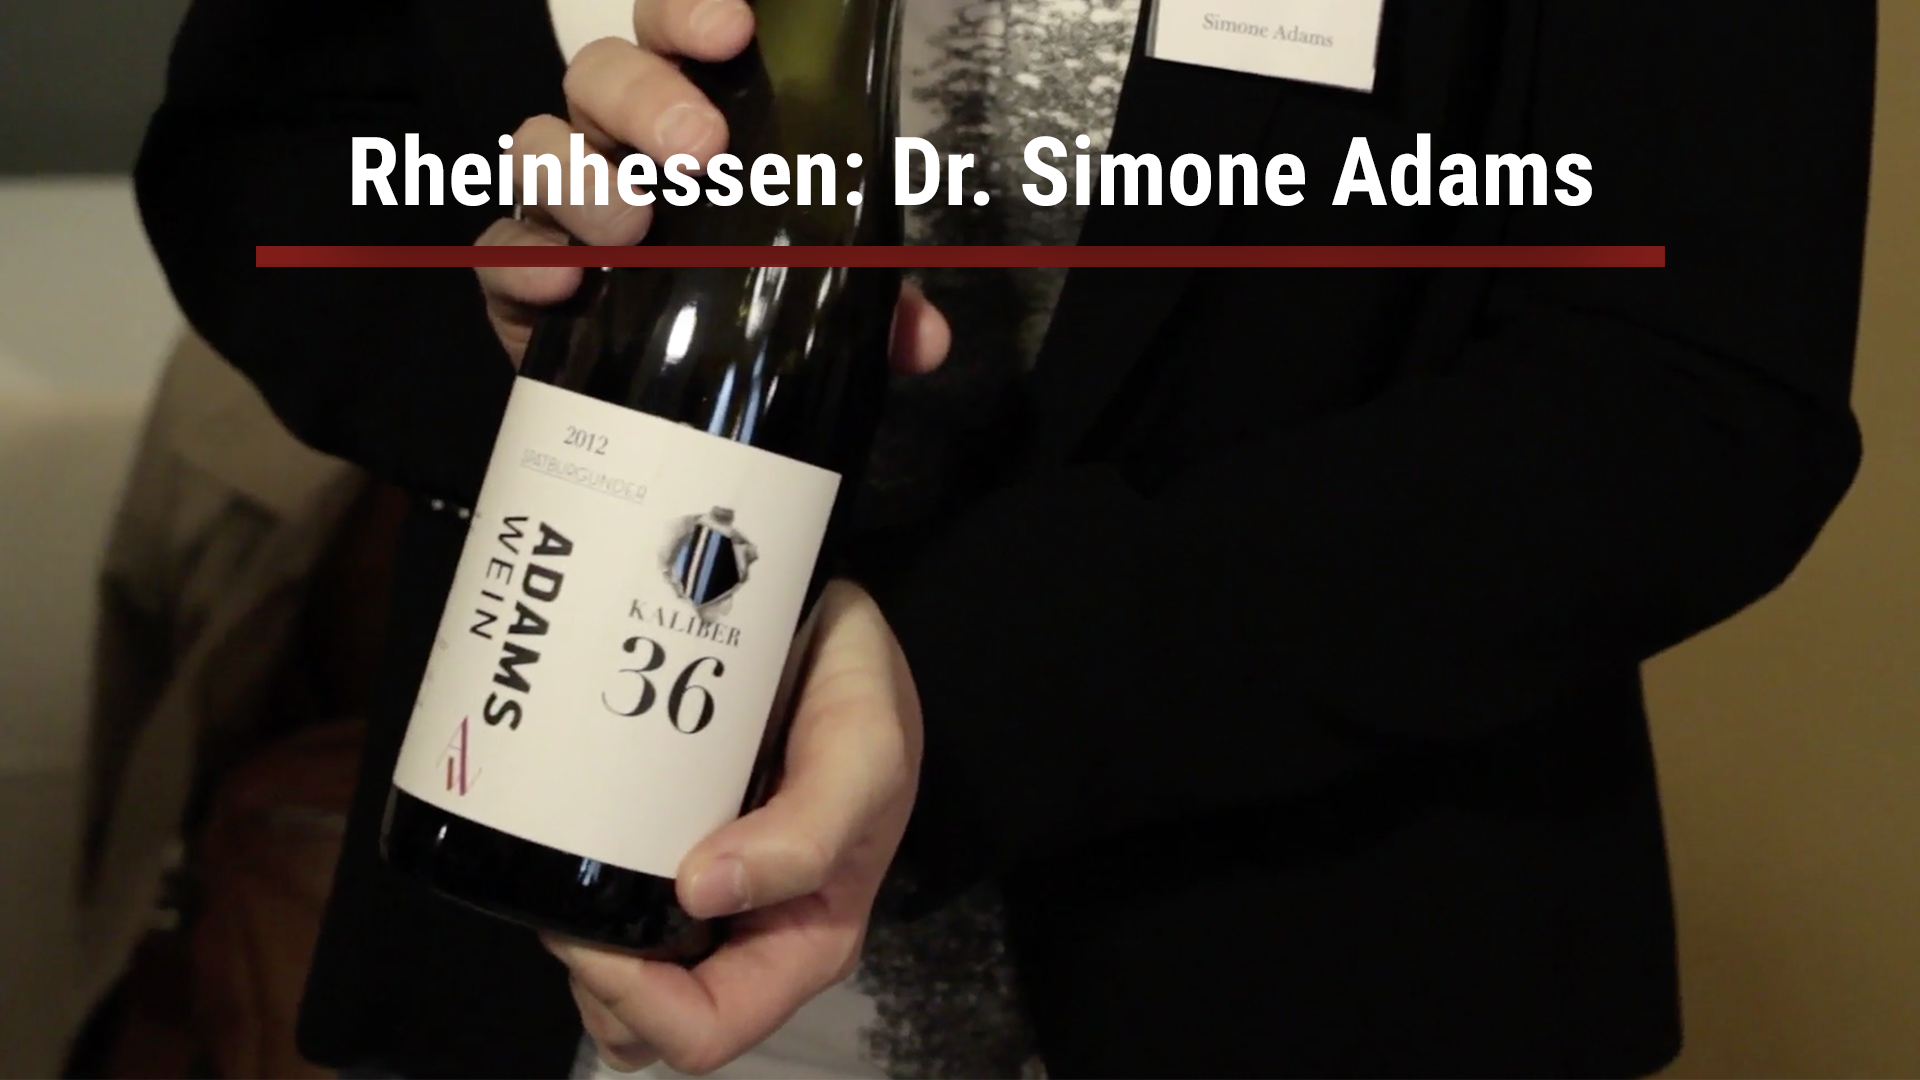 Rheinhessen: Dr. Simone Adams